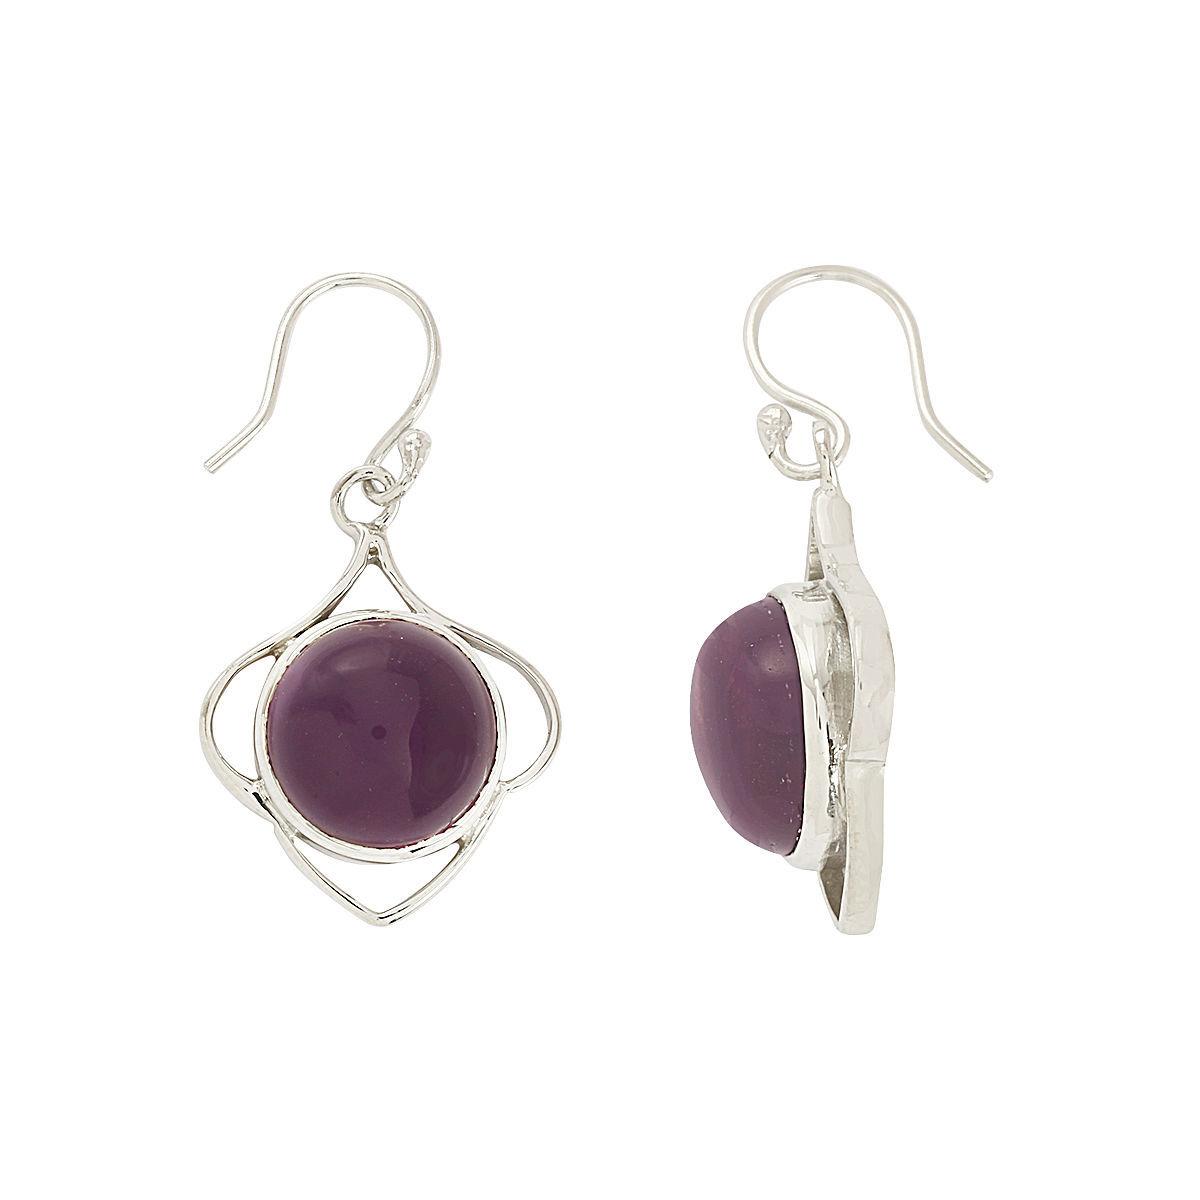 Handmade Amethyst Gemstone Solid 925 Sterling Silver Jewelry Earring SHER0183